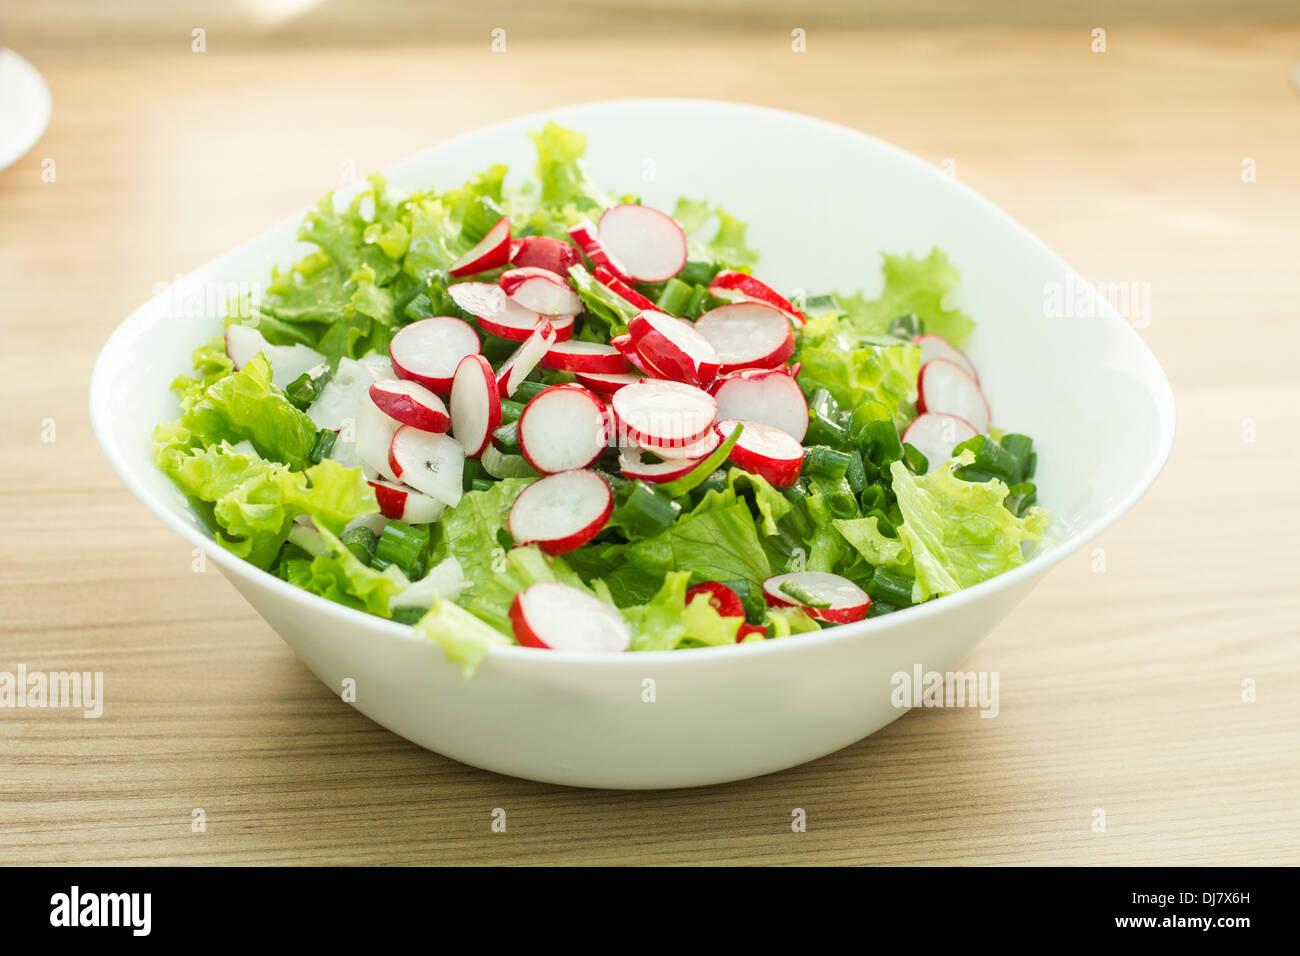 Gesunde Lebensmittel frischer grüner Salat. Stockbild